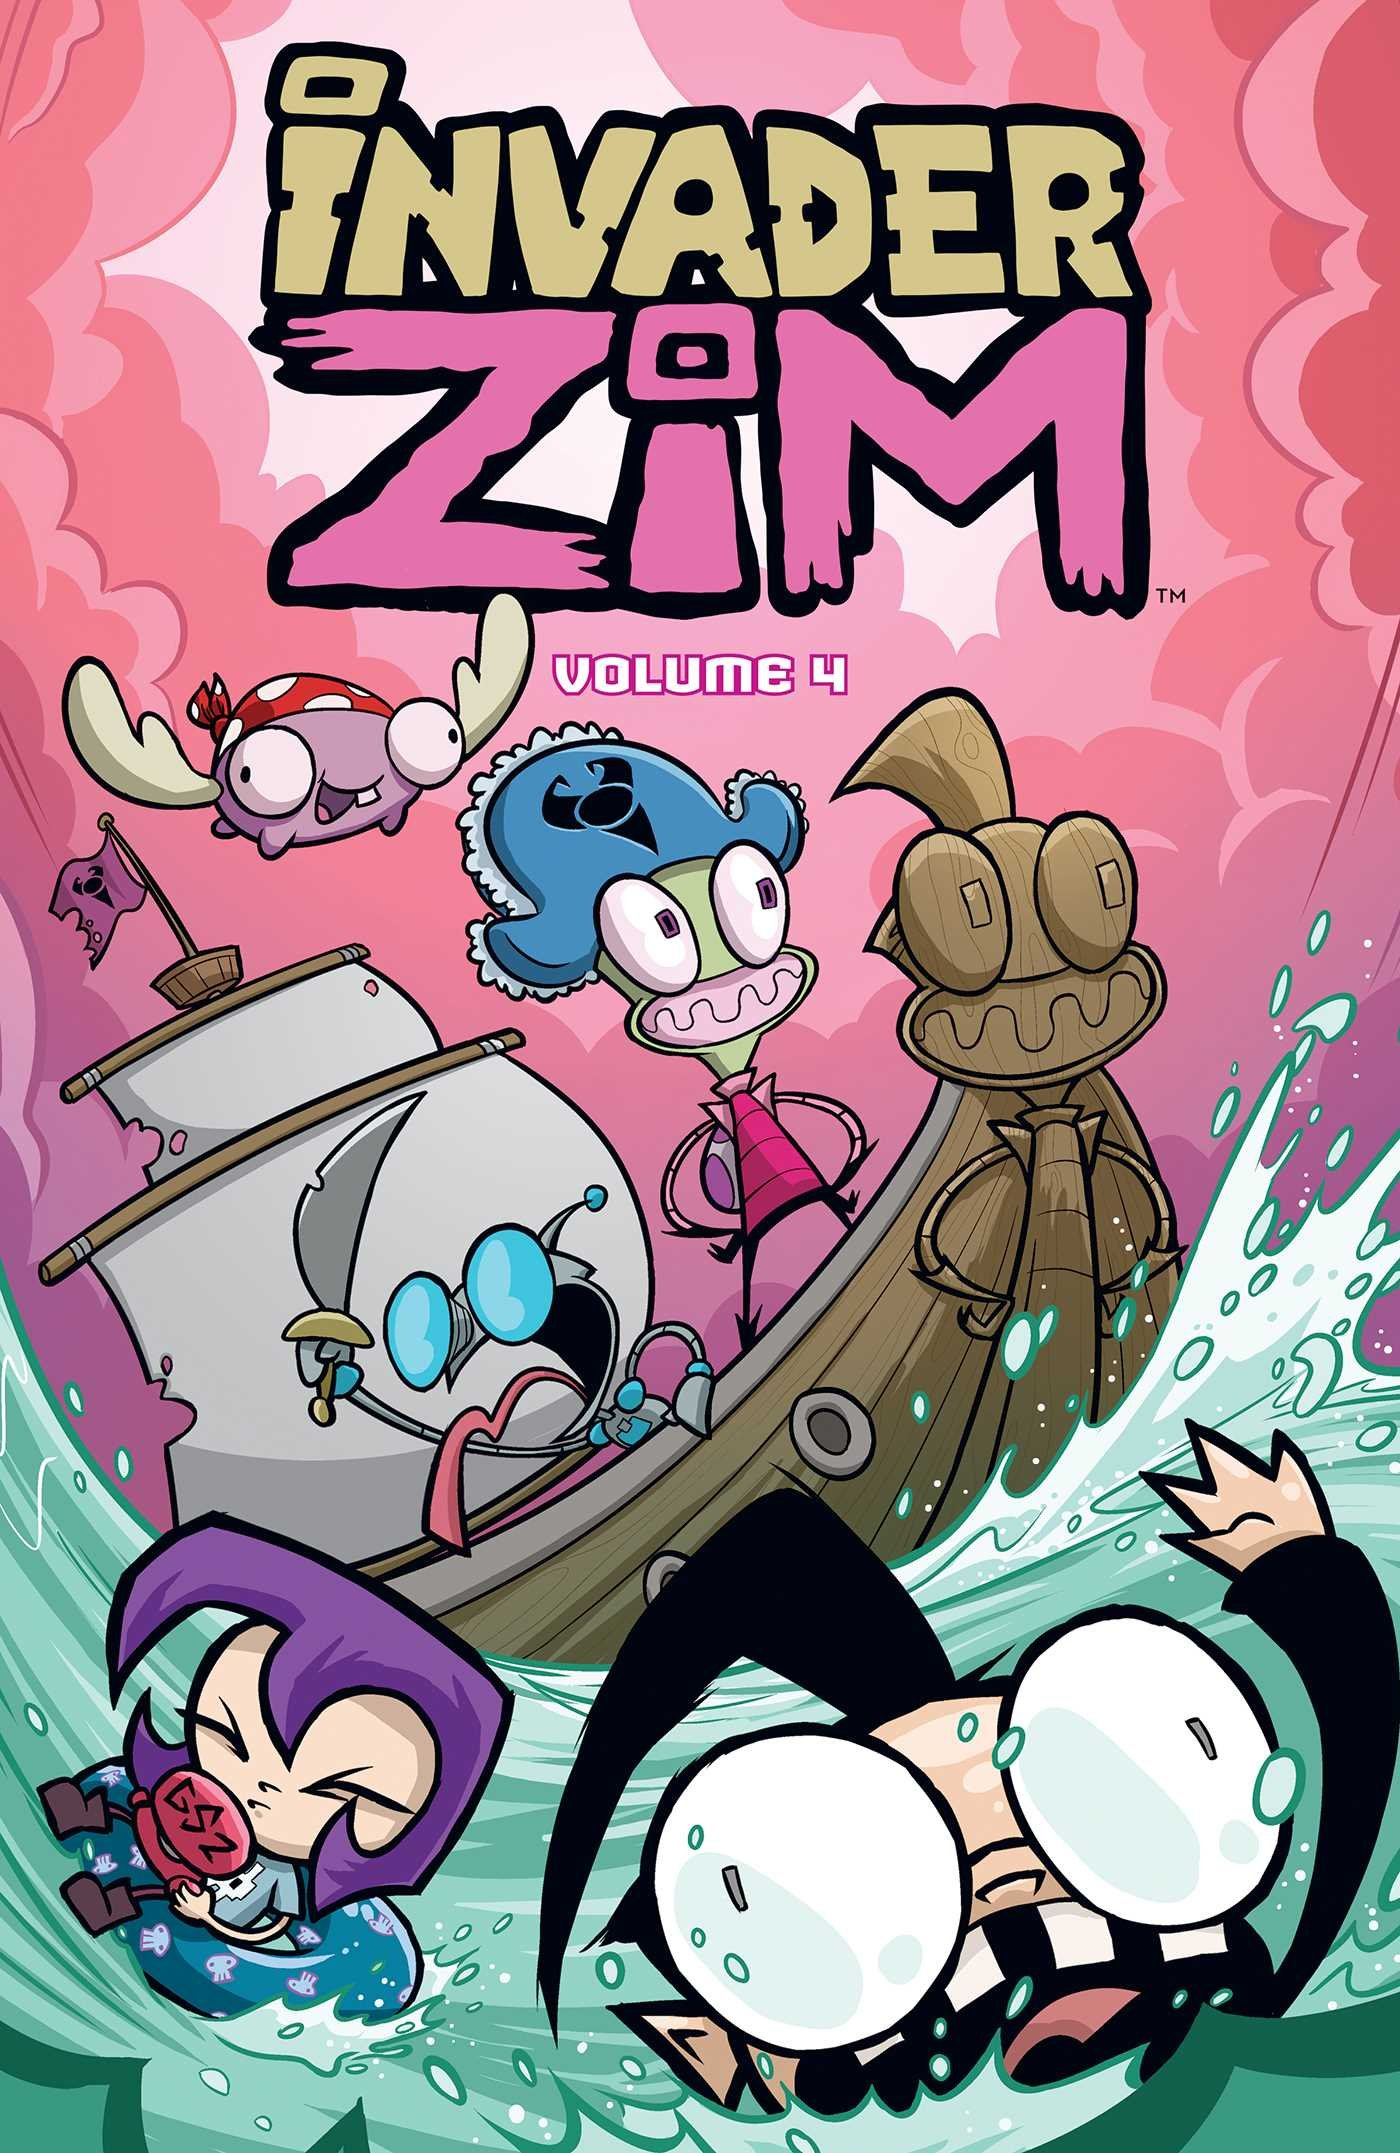 Invader zim dating game free no downloads